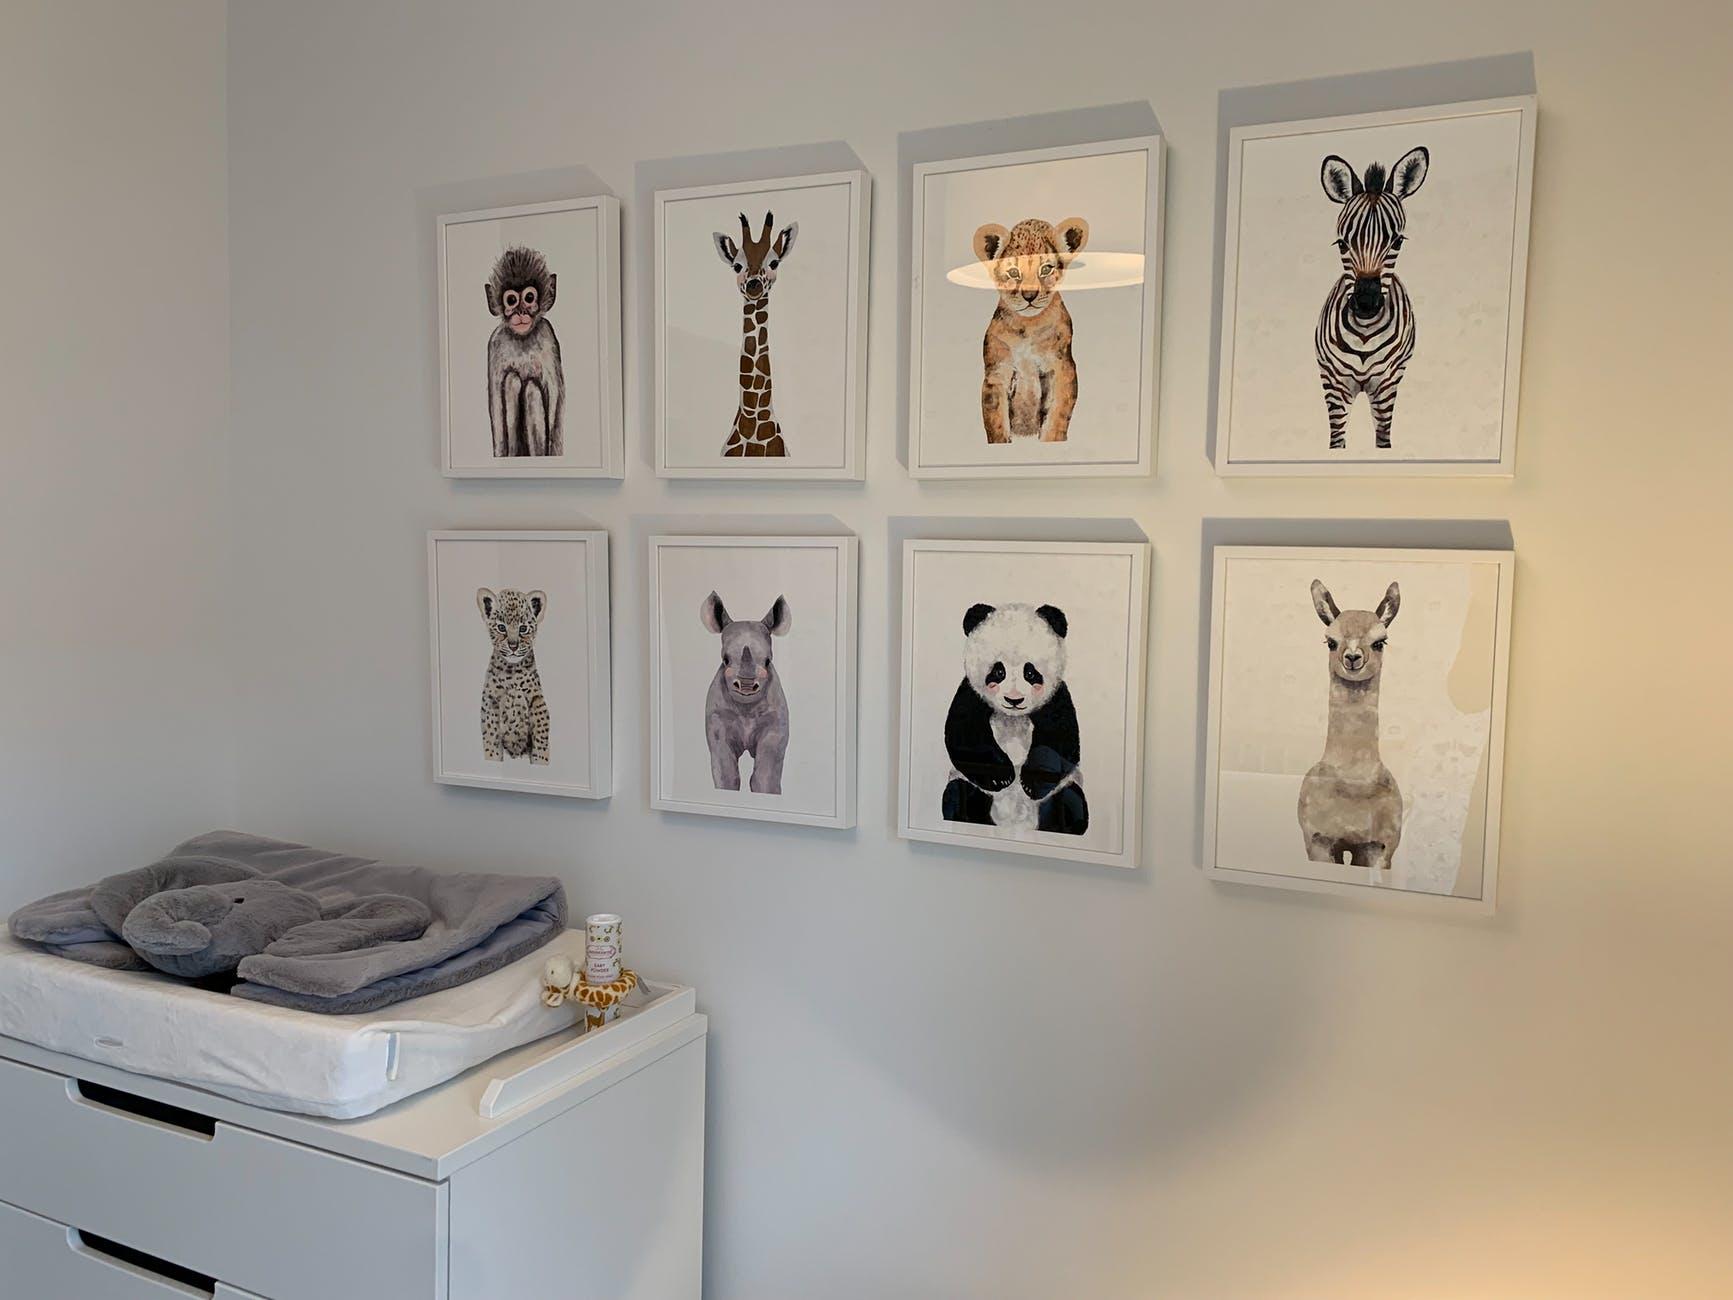 Prints Charming Custom Framing Toronto - Roncesvalles Ave